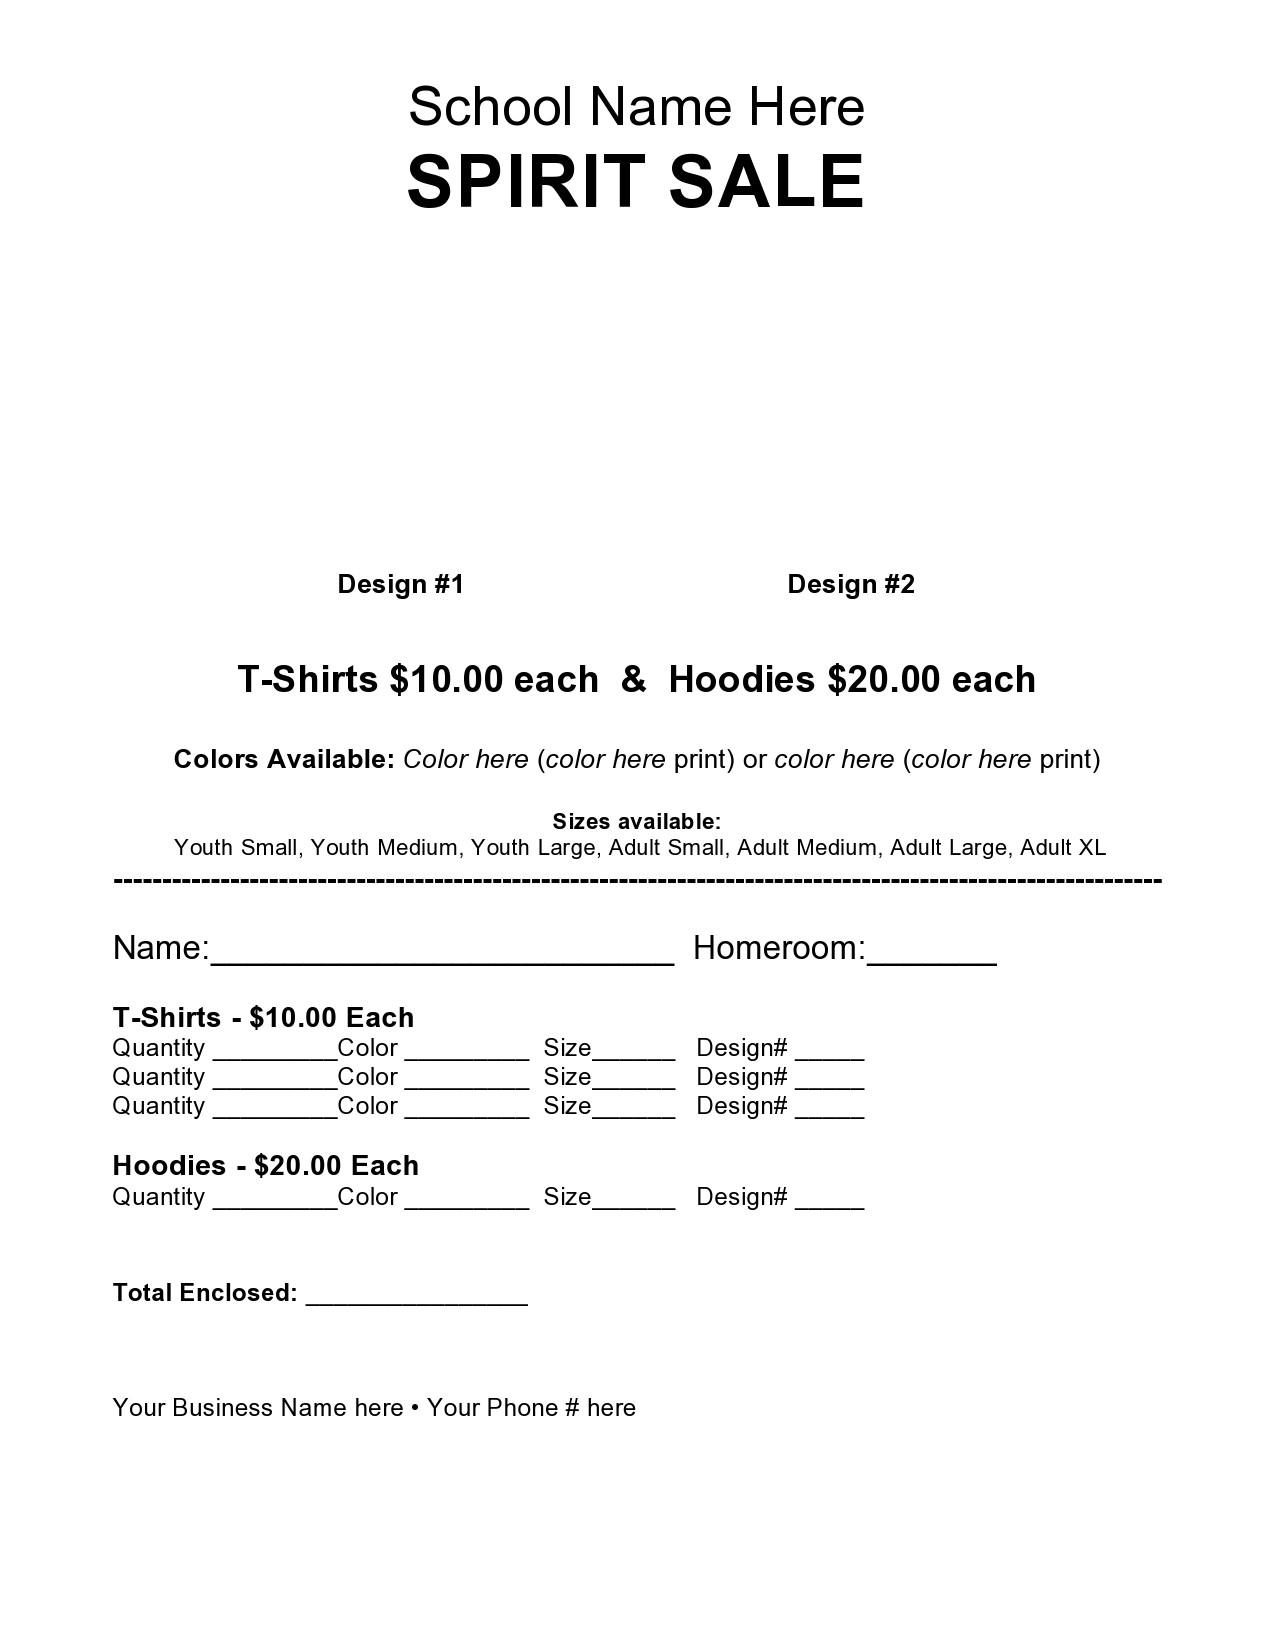 Free fundraiser flyer 21